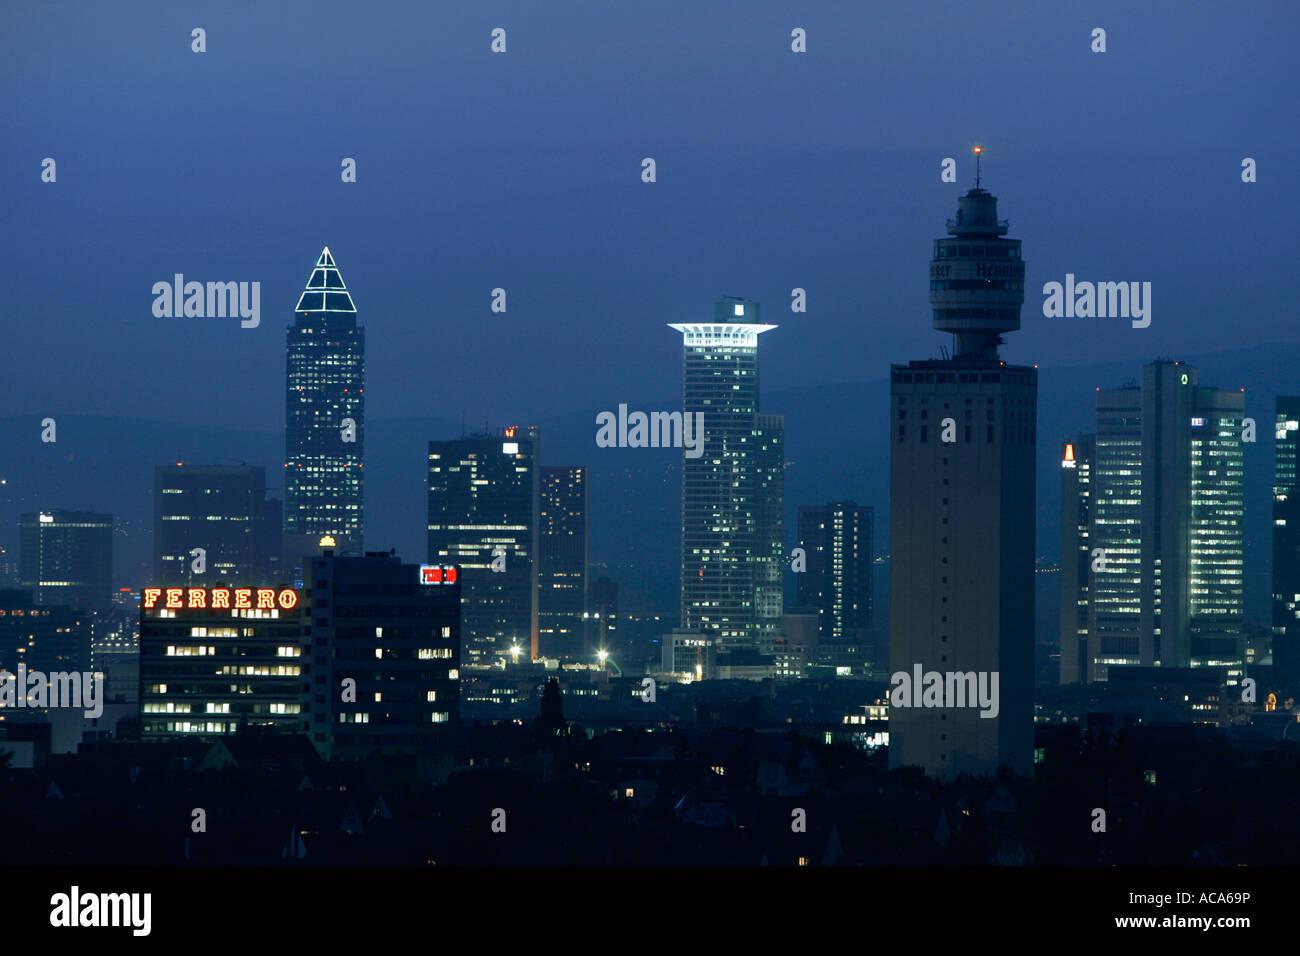 Skyline of Frankfurt am Main with the Henninger tower, at night, Frankfurt, Hesse, Germany - Stock Image